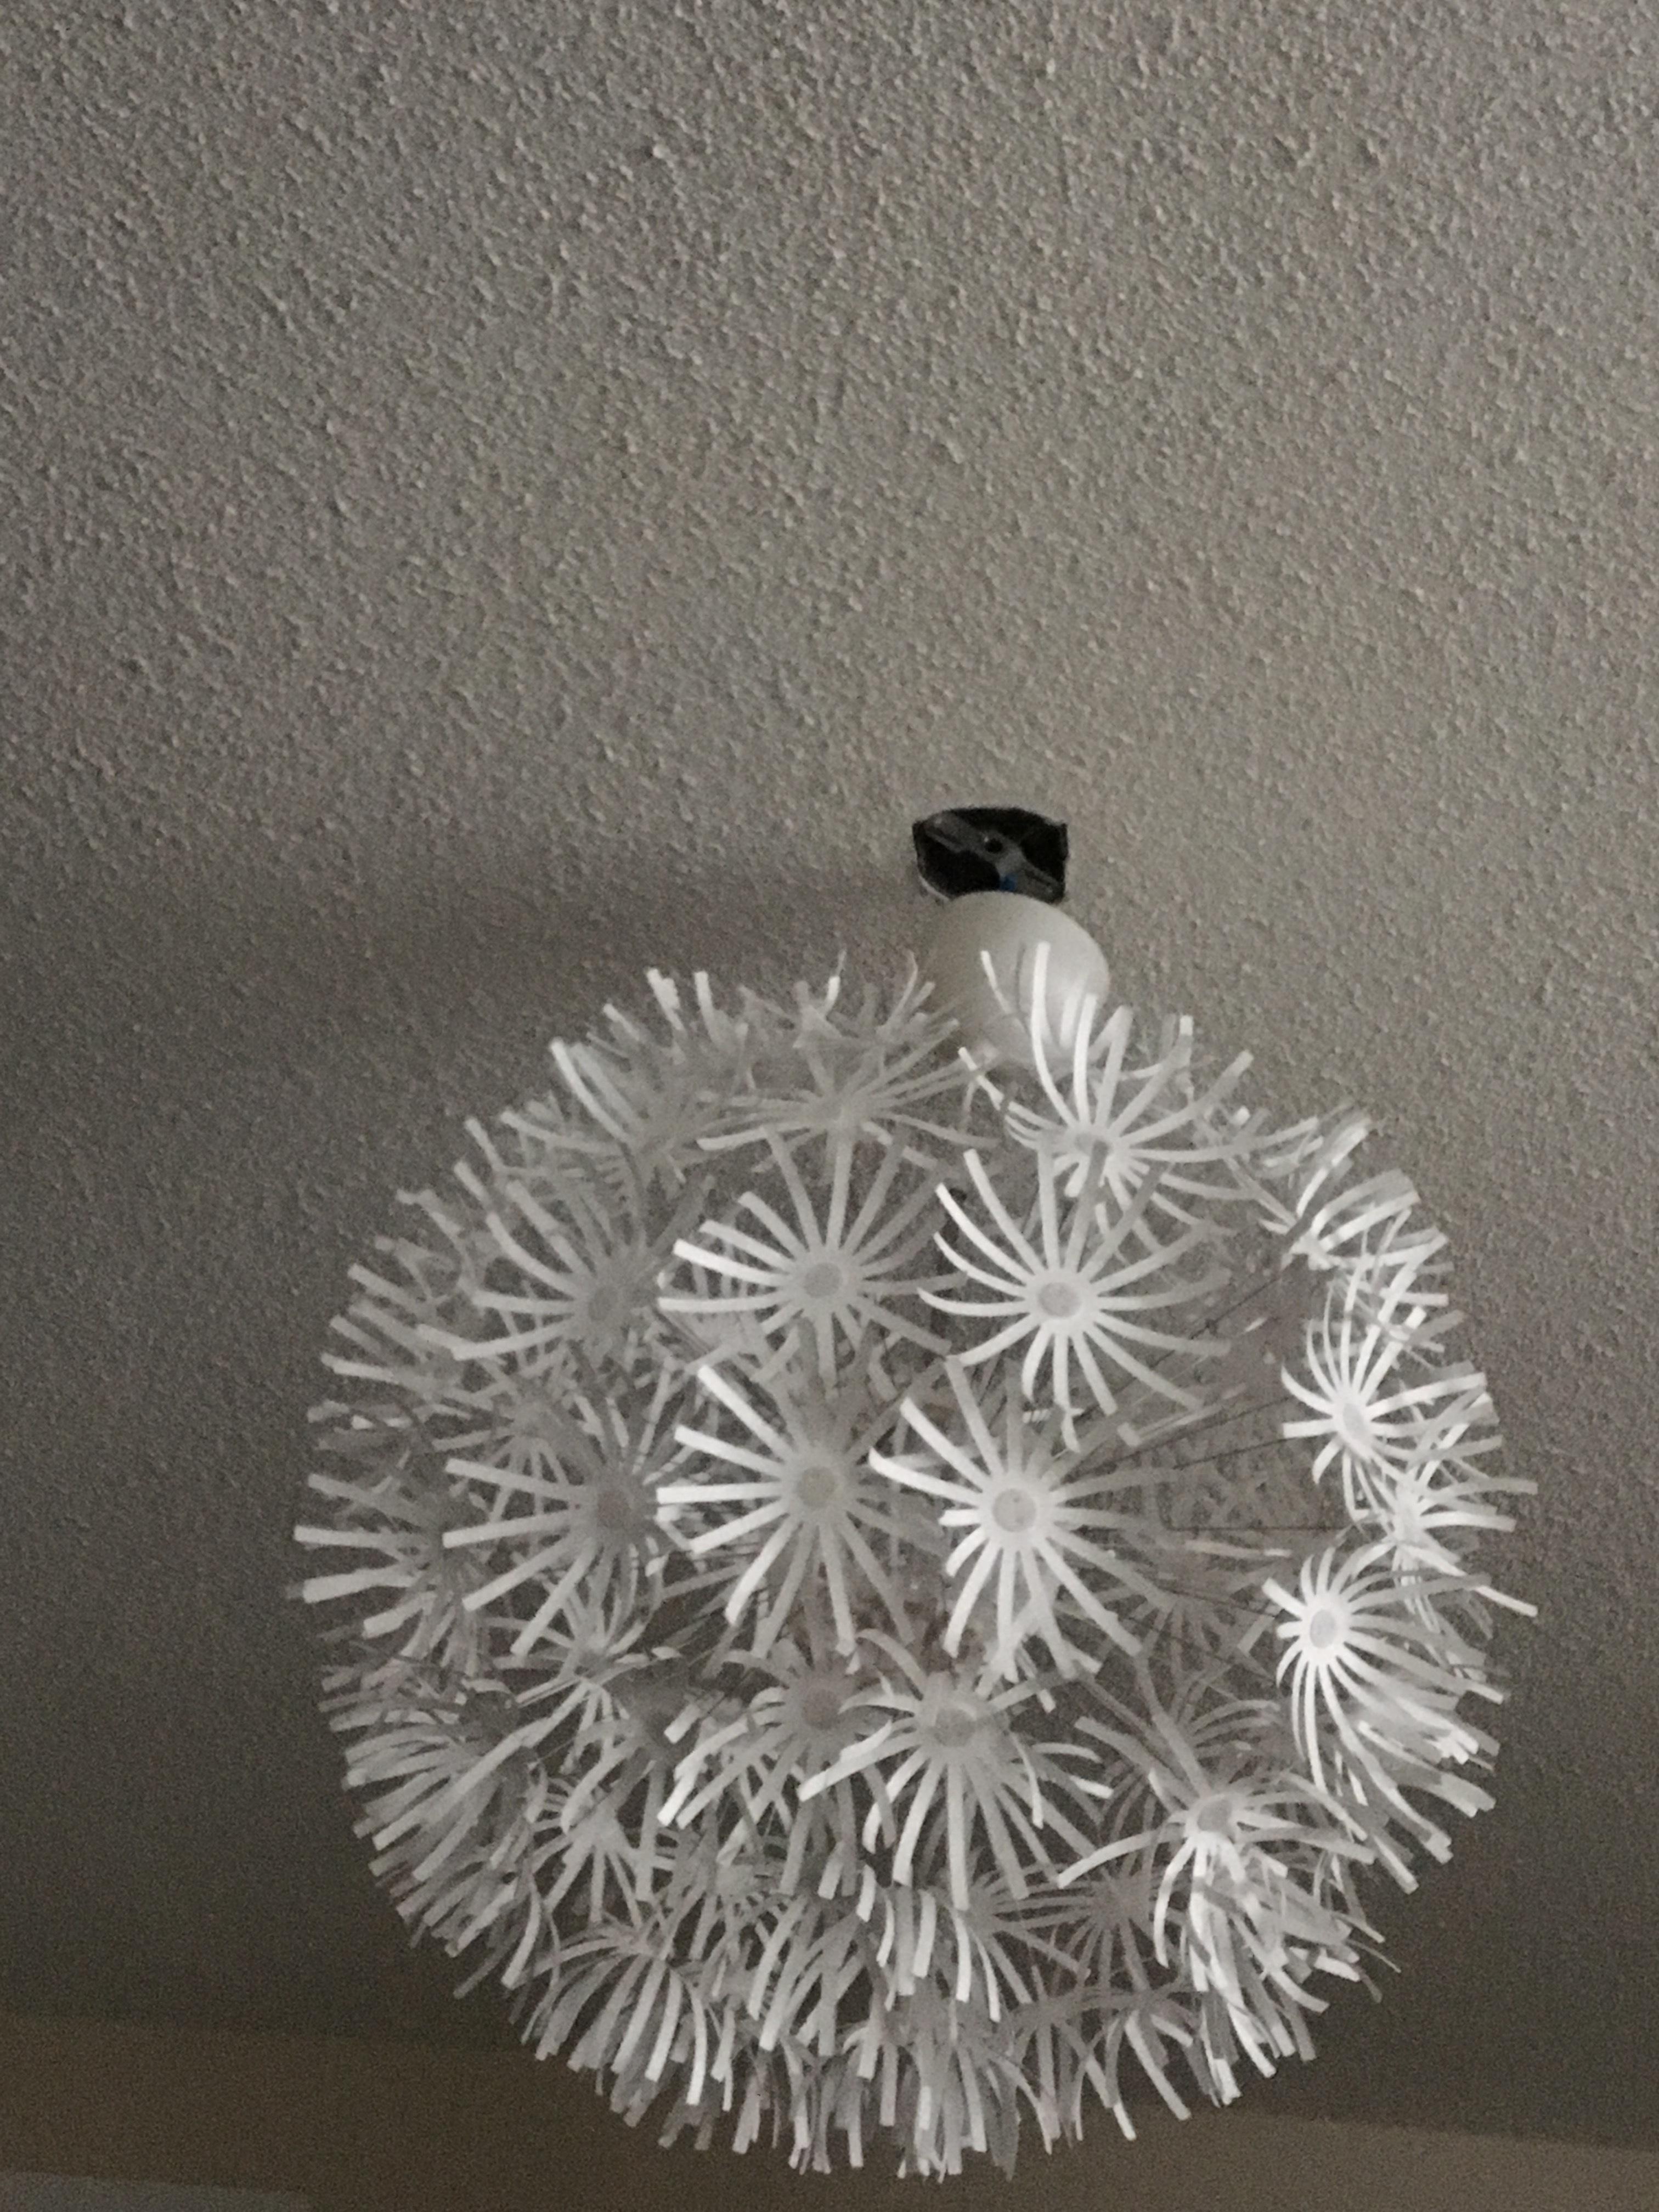 ikea ps maskros ceiling light reviews in lighting & fans - chickadvisor